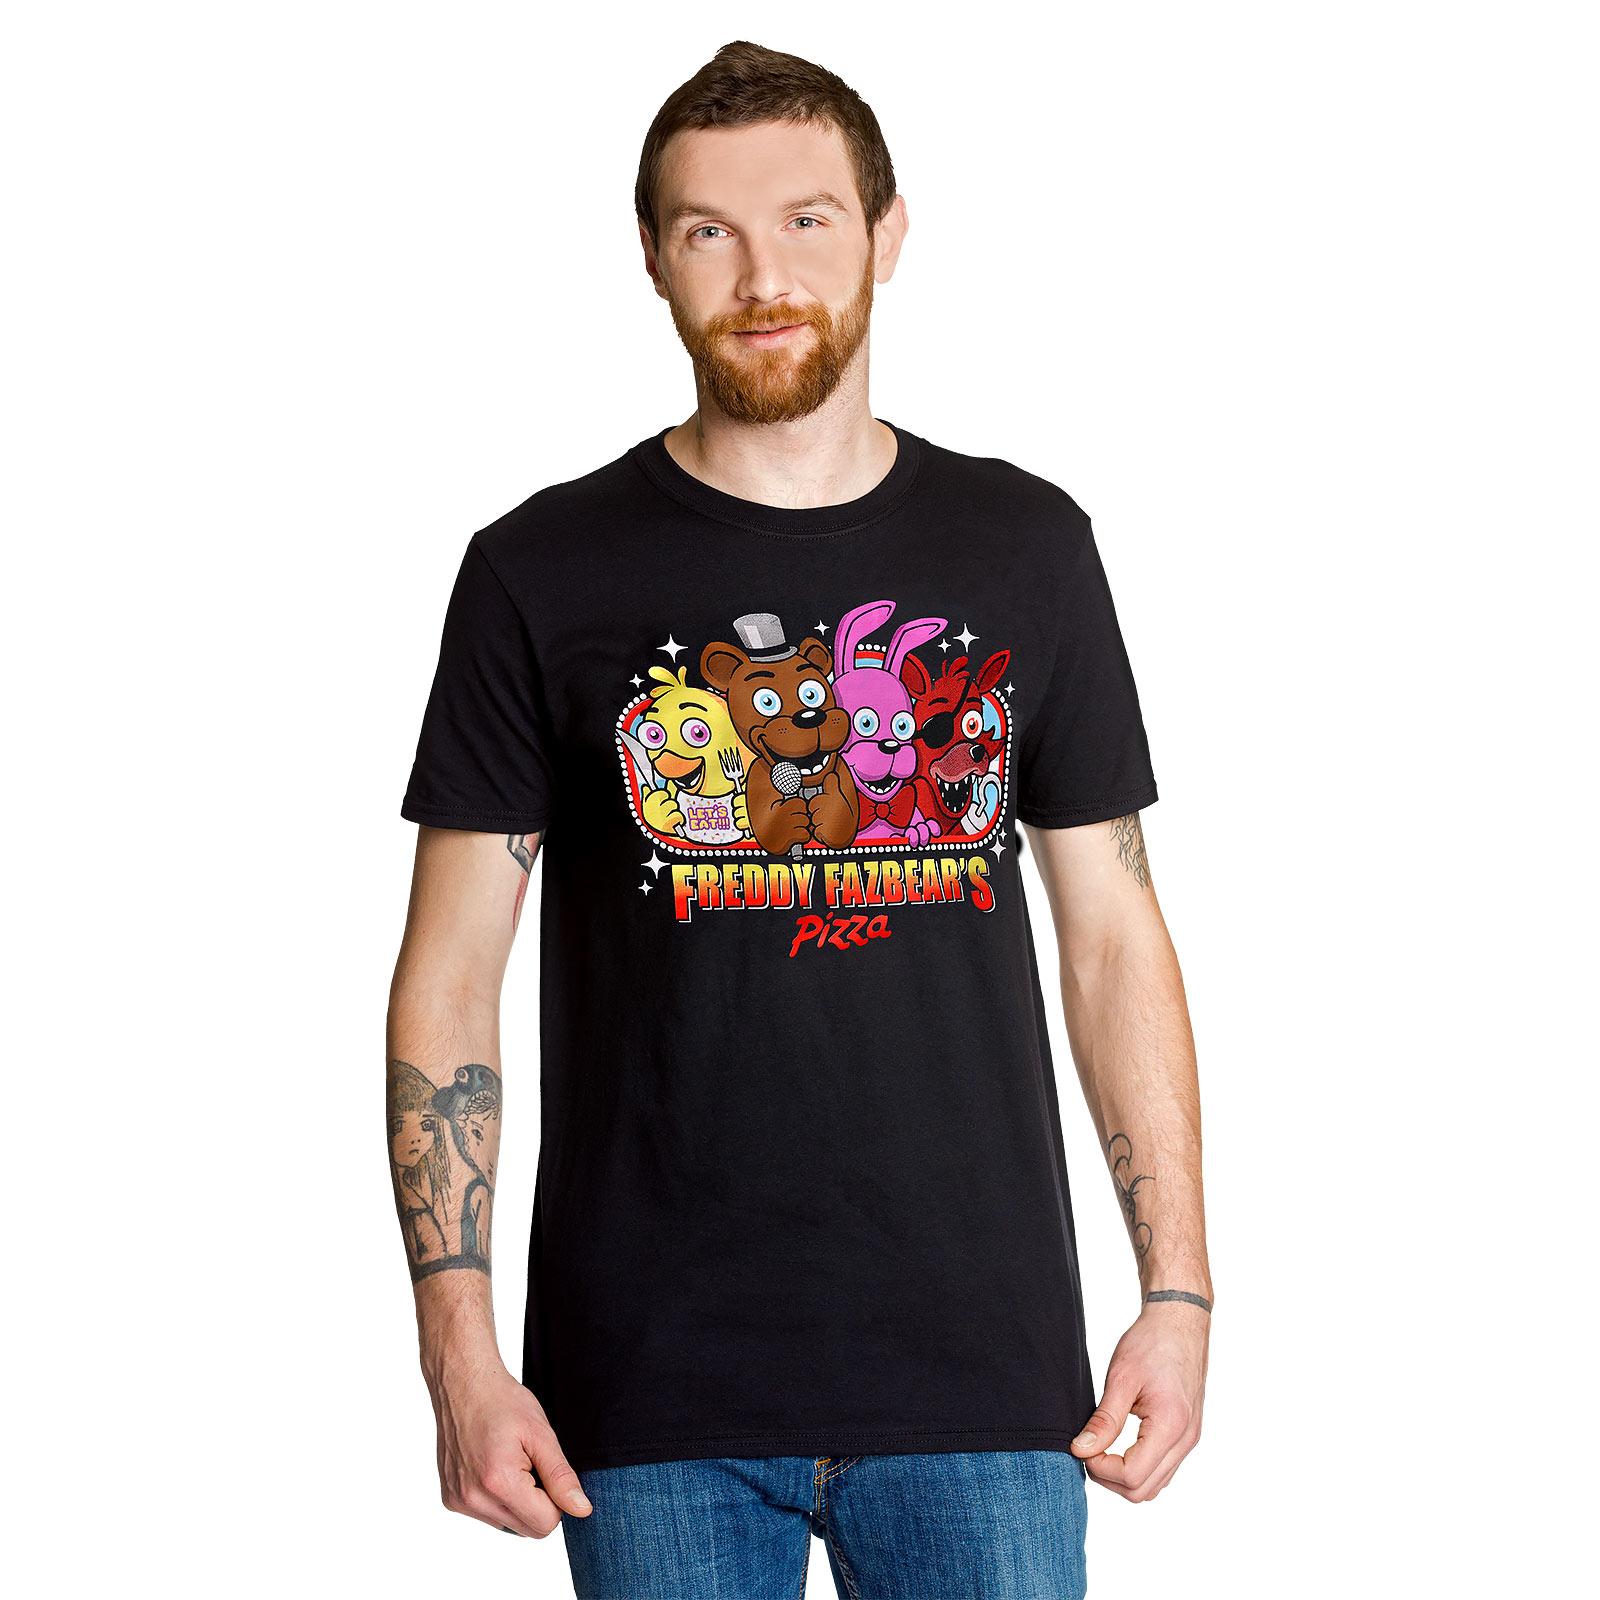 Five Nights at Freddys - Freddy Fazbears Pizza T-Shirt